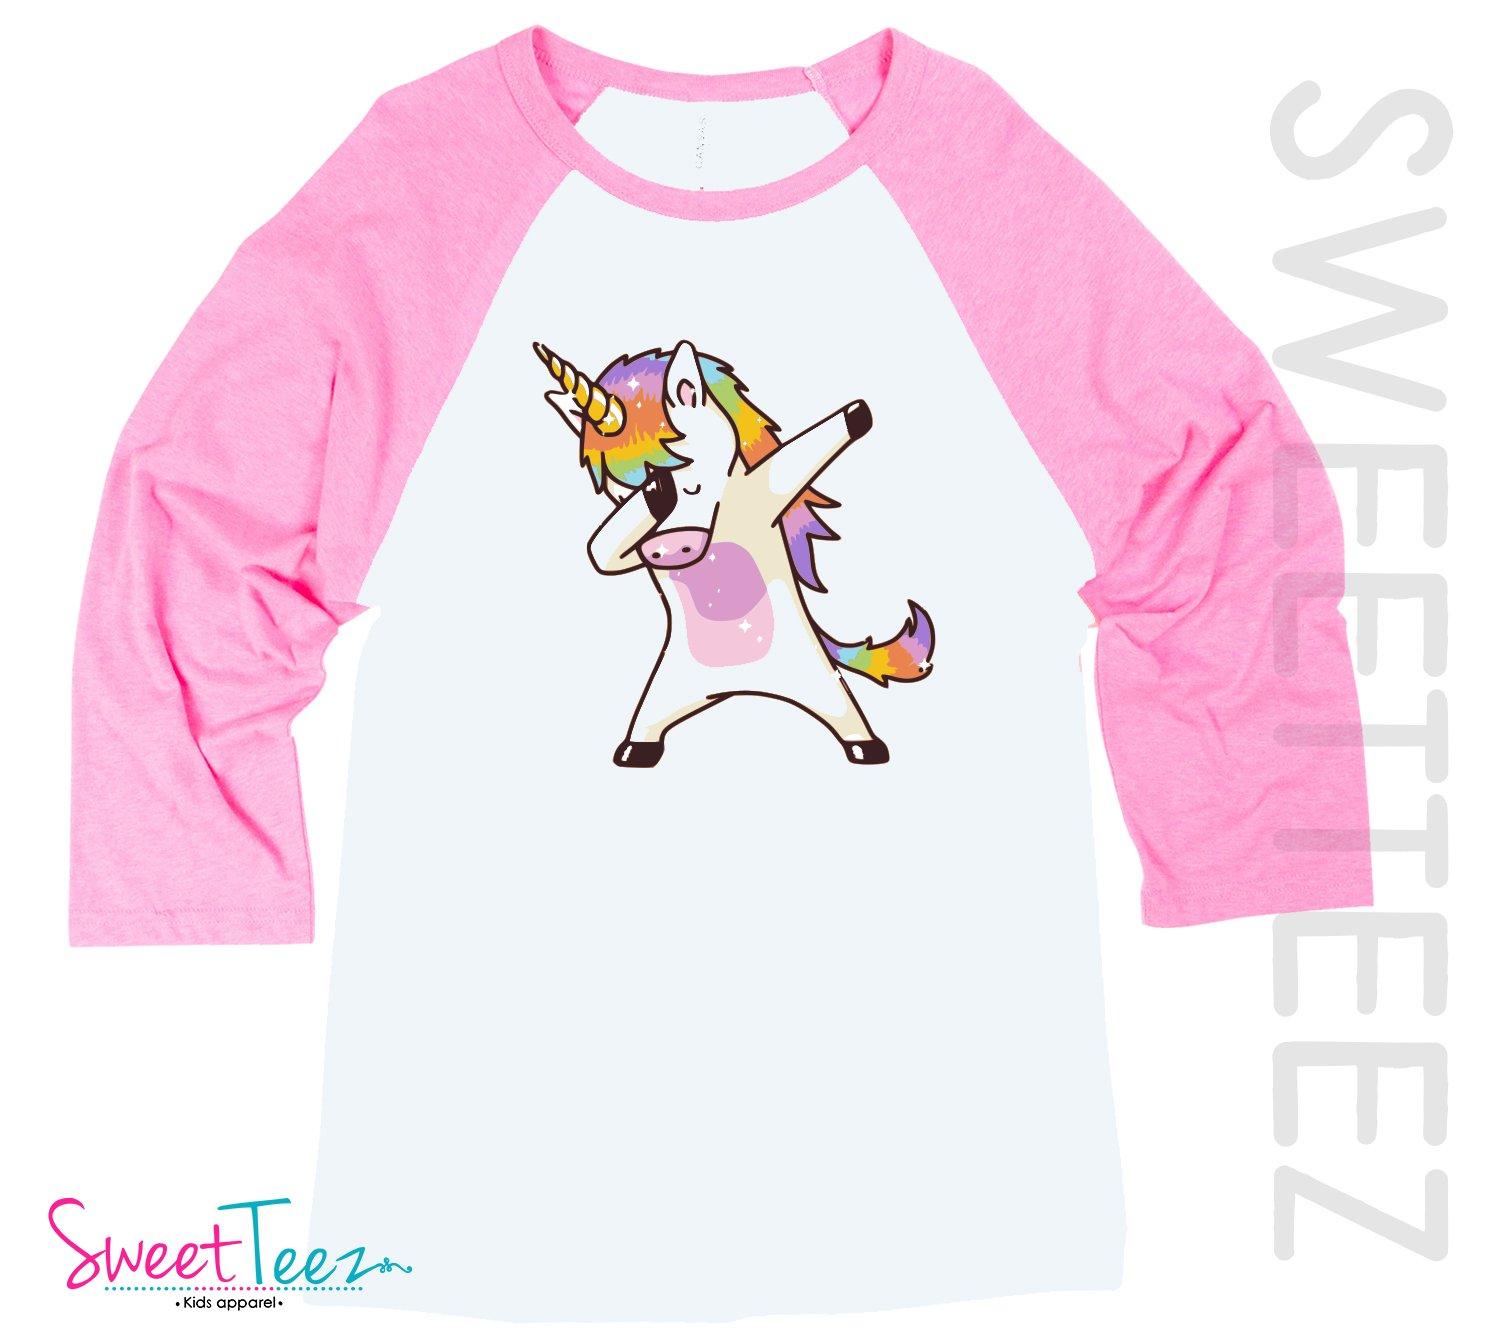 Unicorn Shirt Women Shirt Dabbing Unicorn Hip Pink Shirt Gift